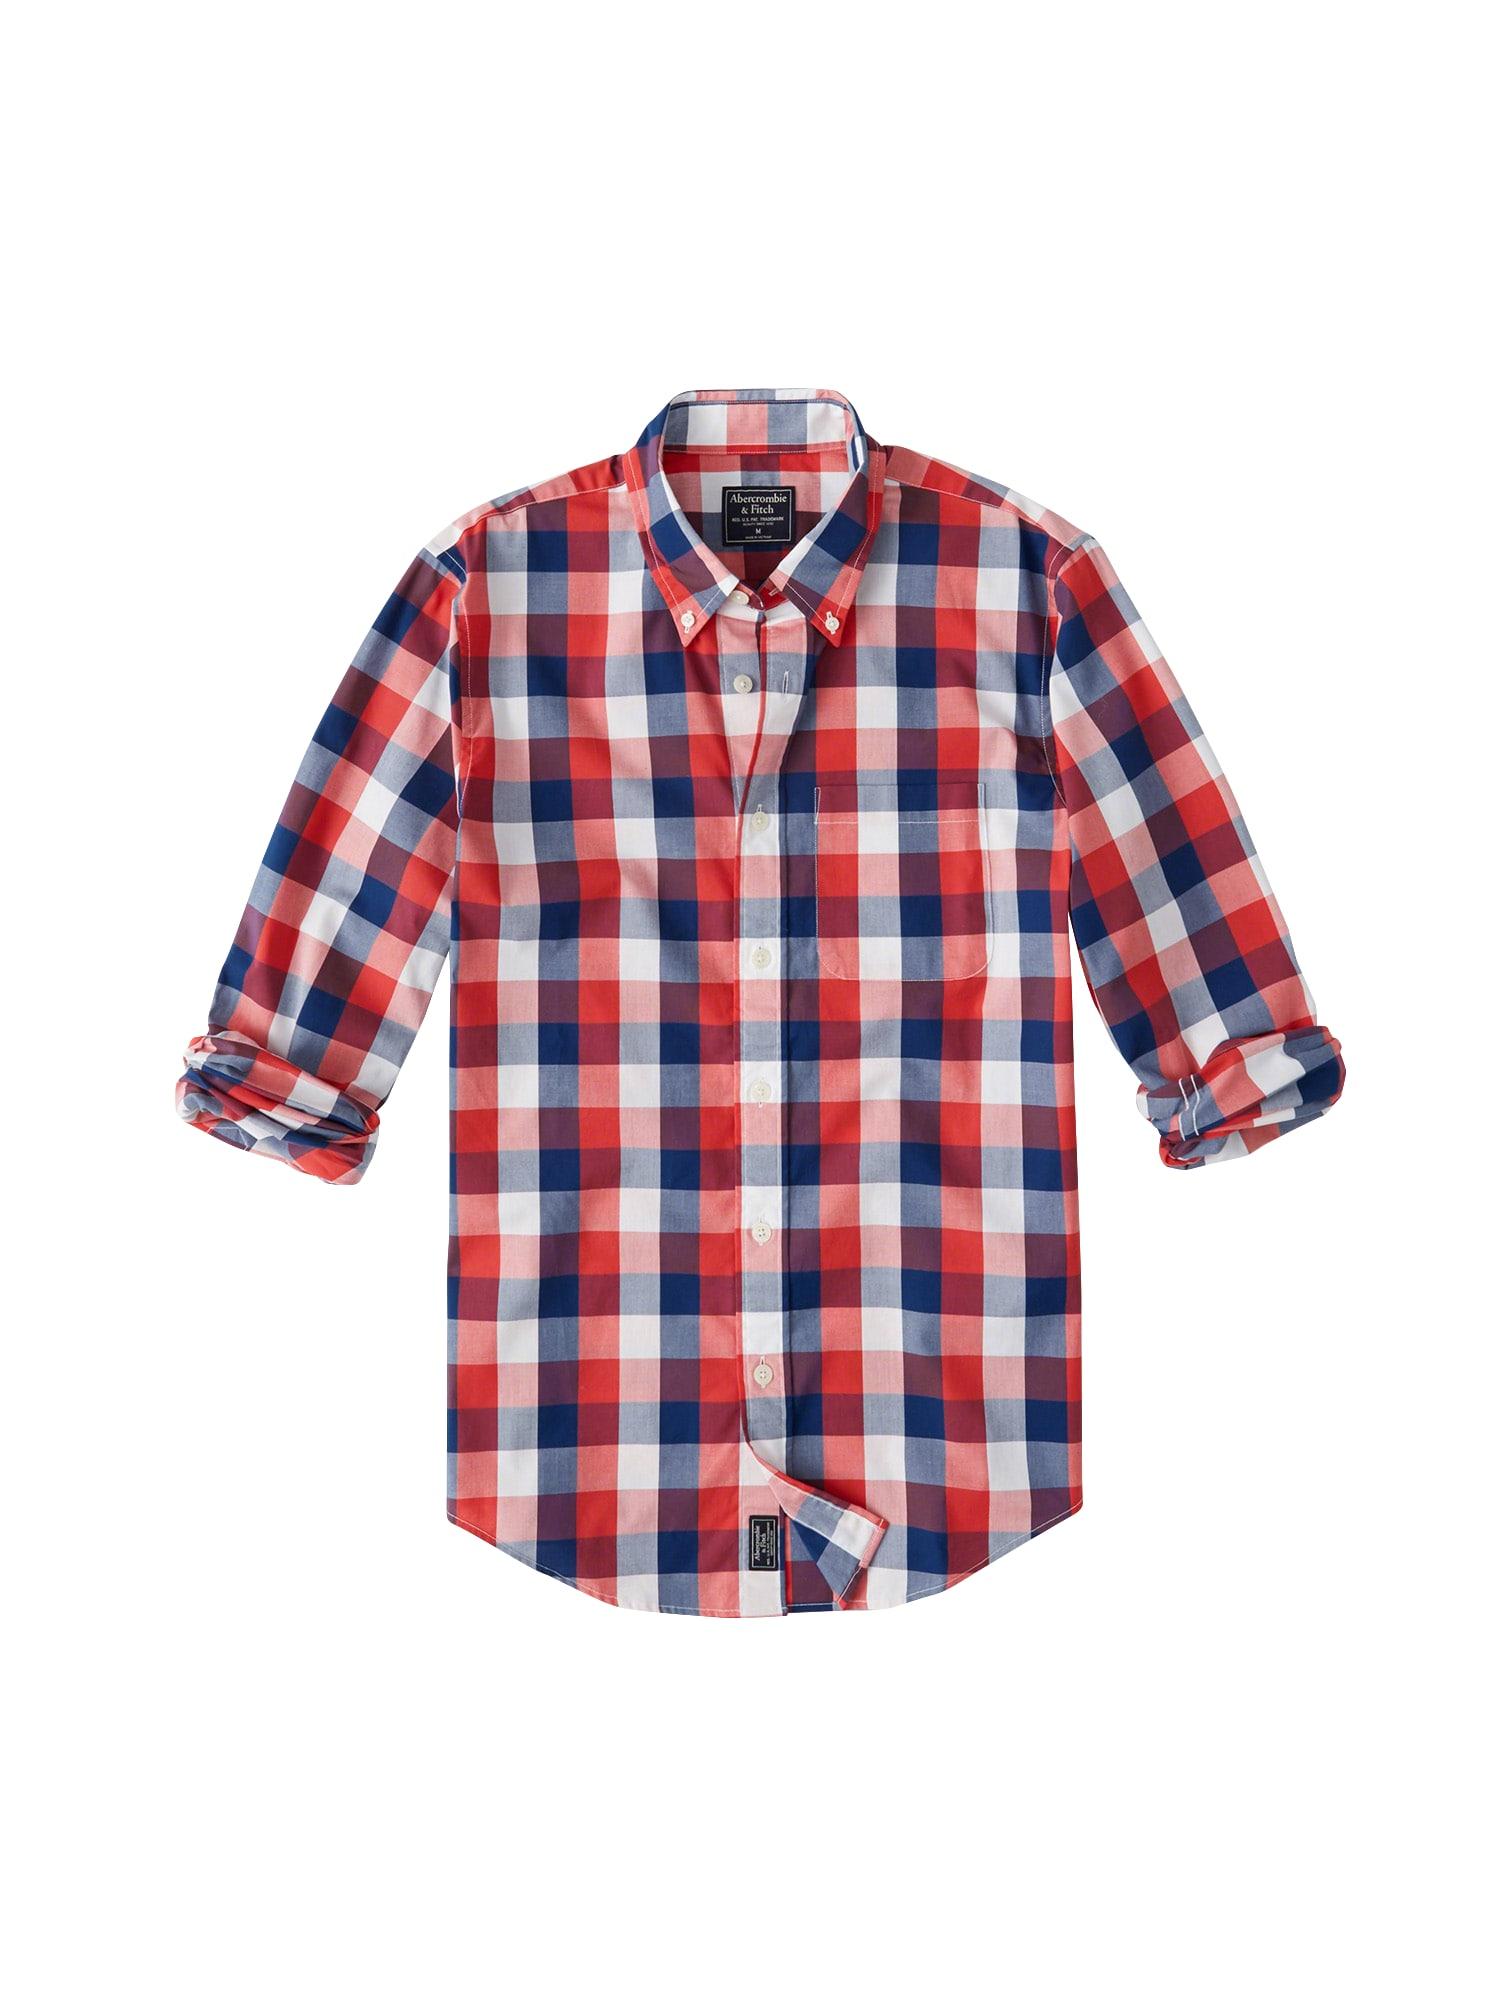 Košile CHECK POPLIN TRO červená Abercrombie & Fitch